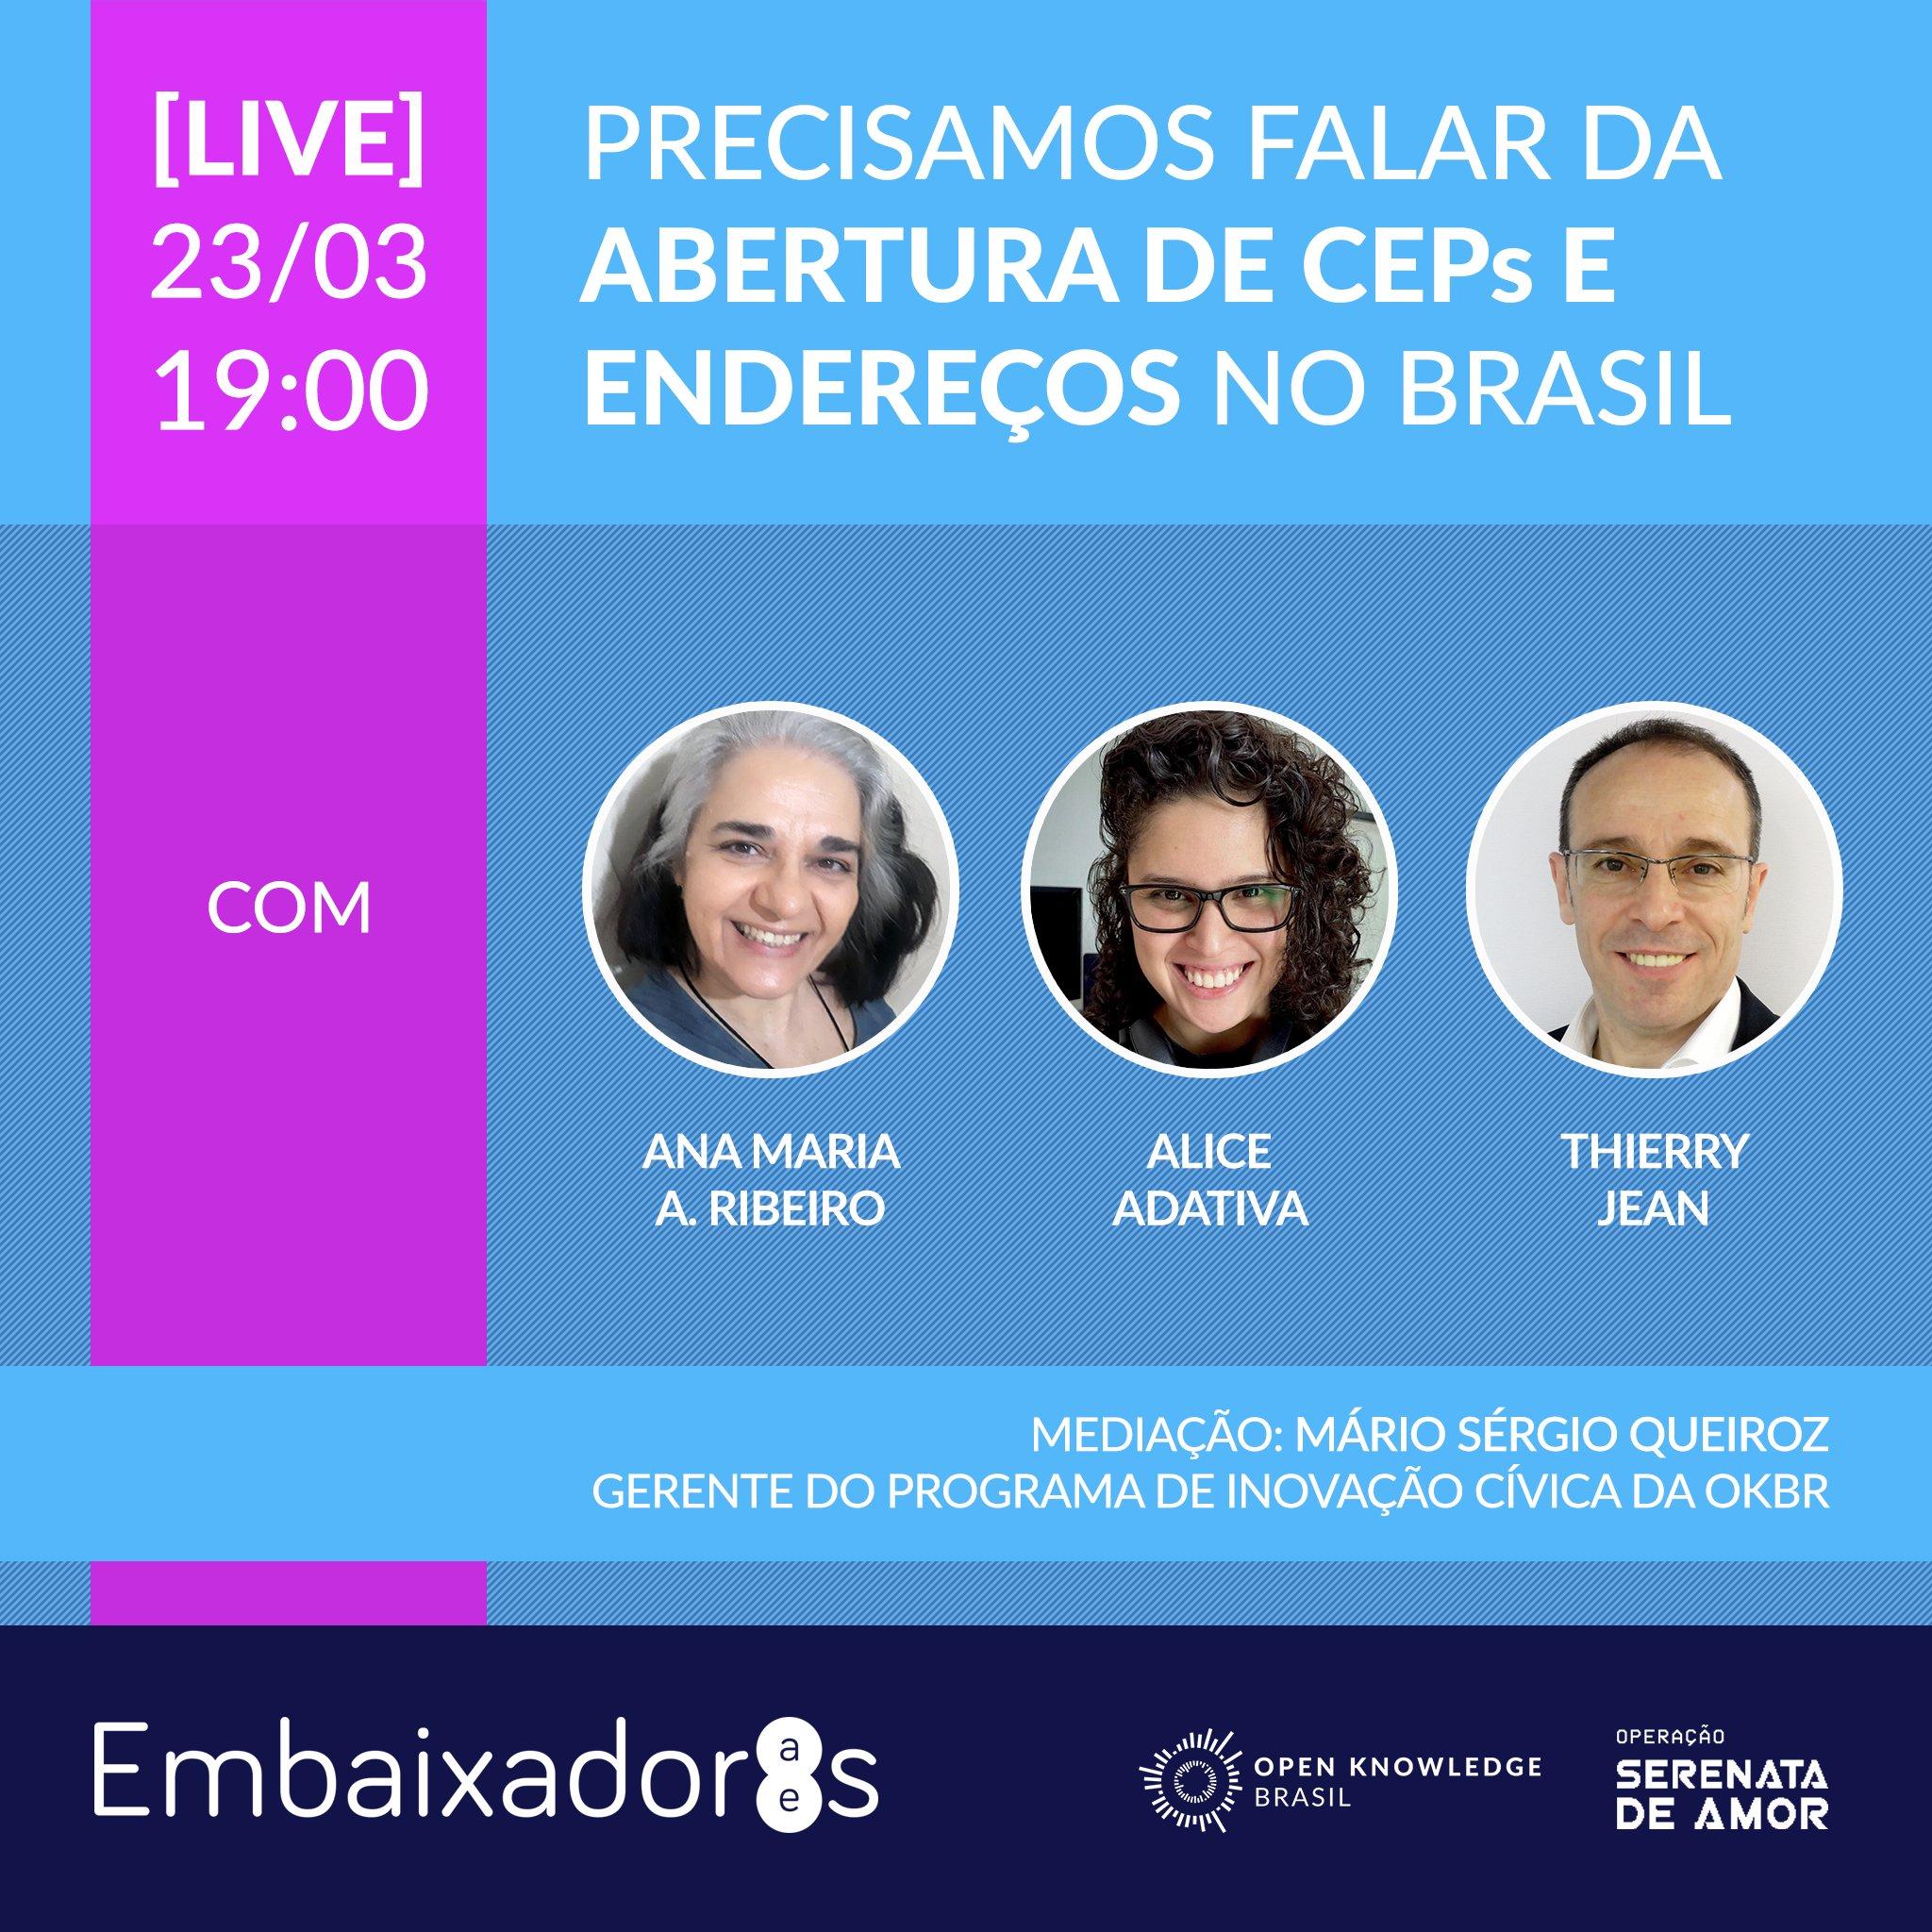 abertura de CEPS´ no Brasil